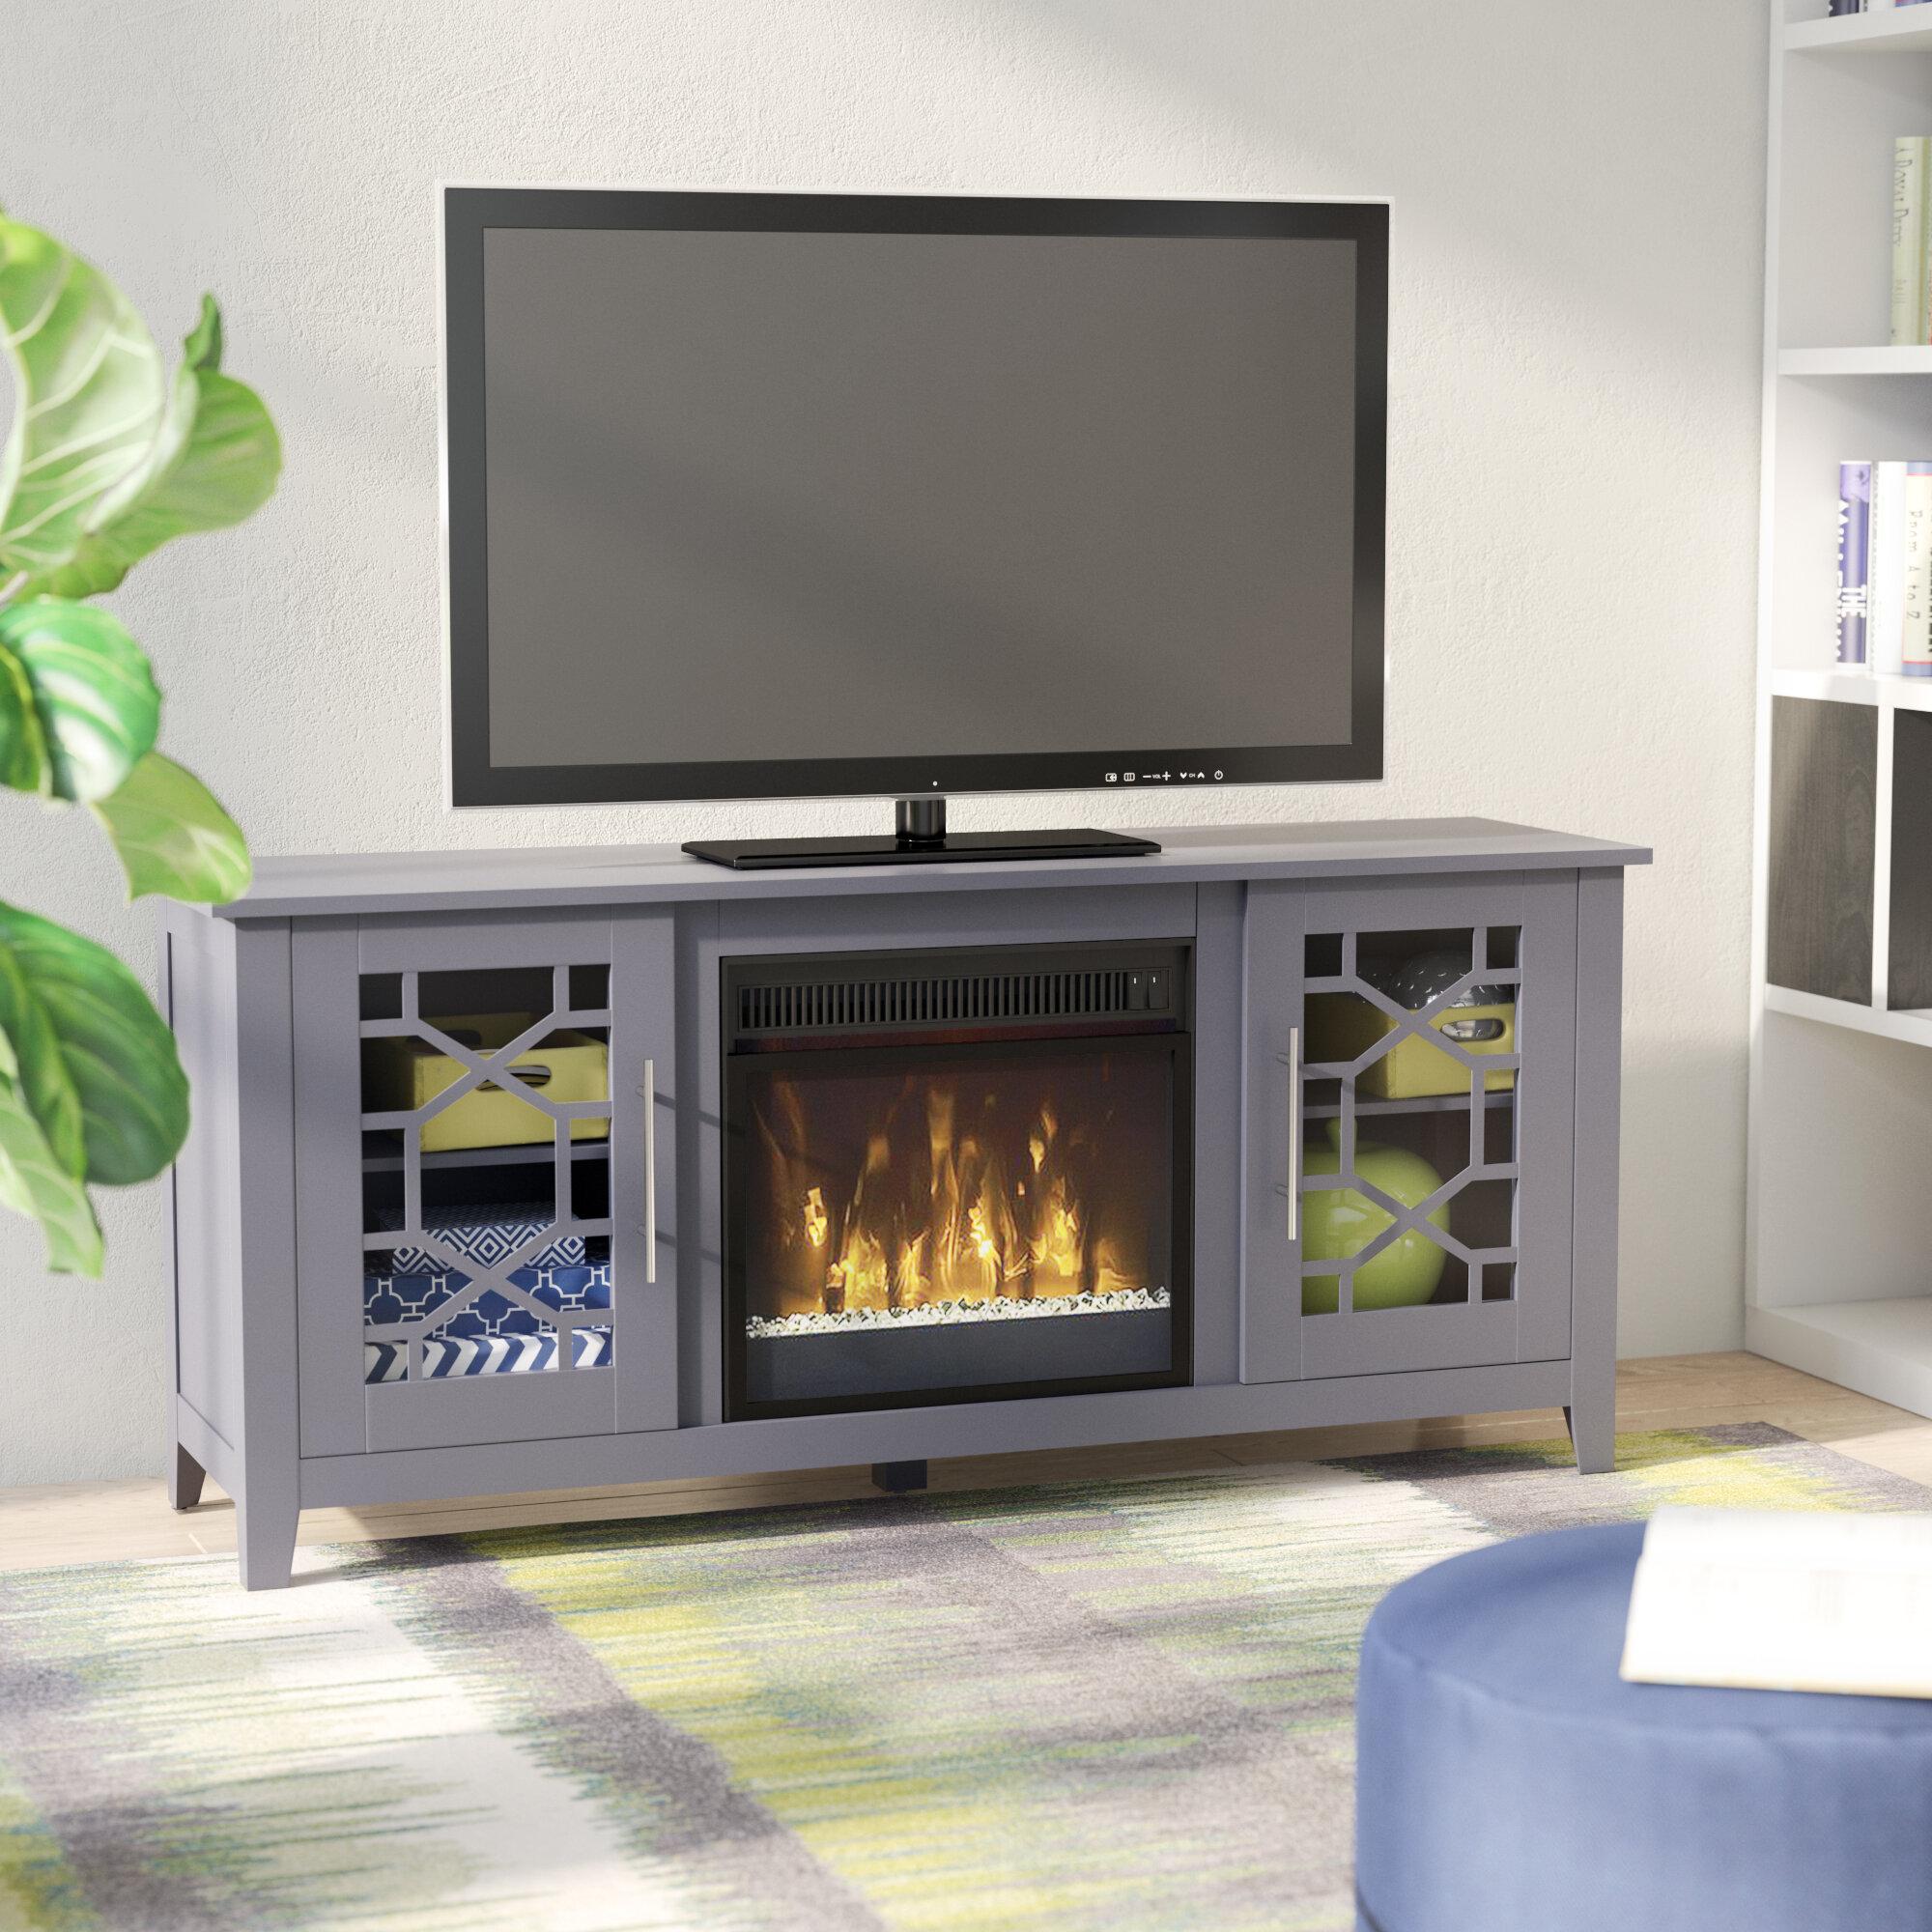 foundry tv stand fireplace wayfair laurel reviews furniture farmhouse dresser modern pdx serein with